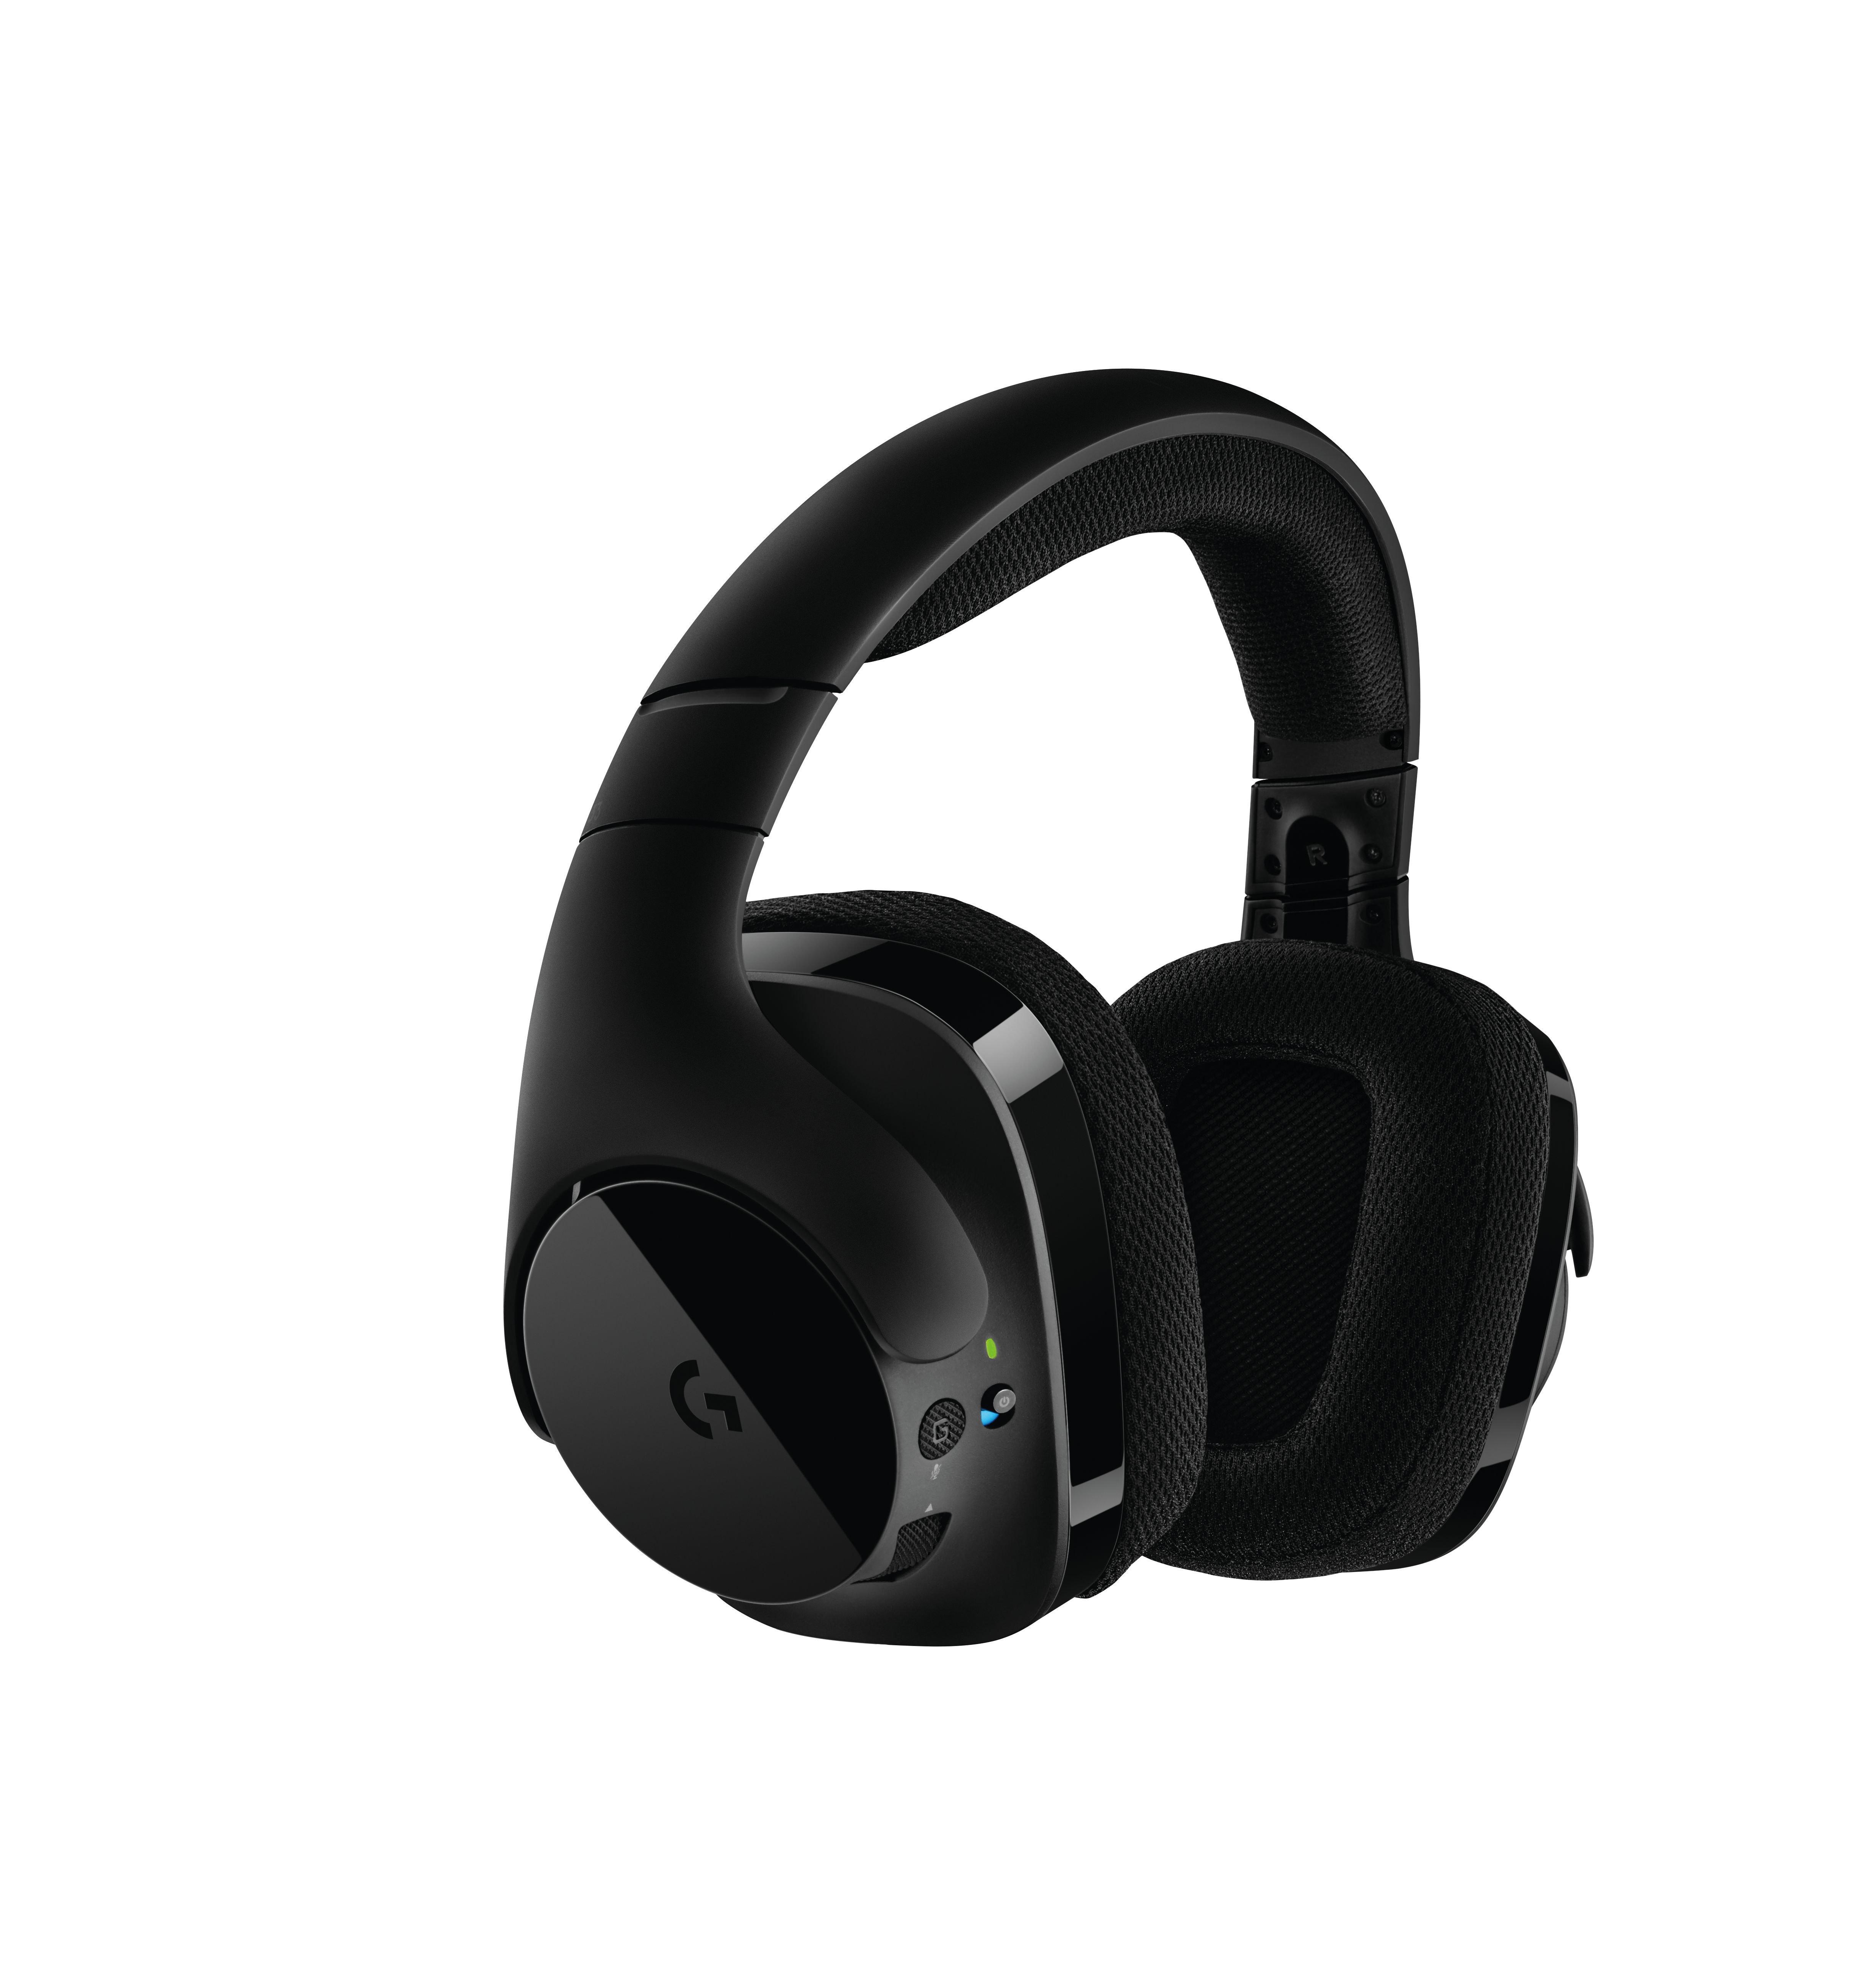 Logitech - G533 Wireless Gaming Headset